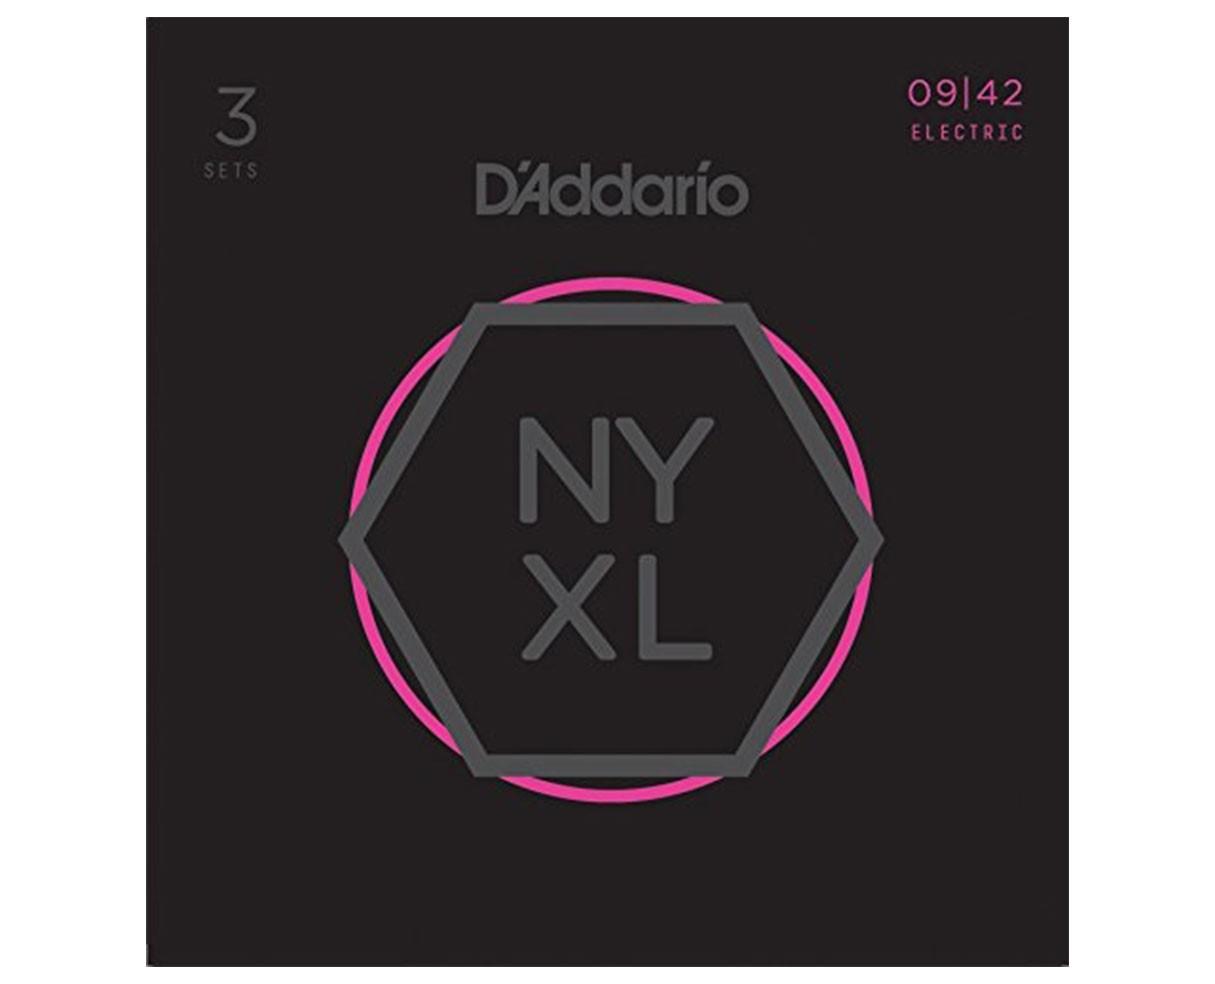 D'Addario NYXL0942-3P Nickel Wound, Super Light, 09-42 3-Pack